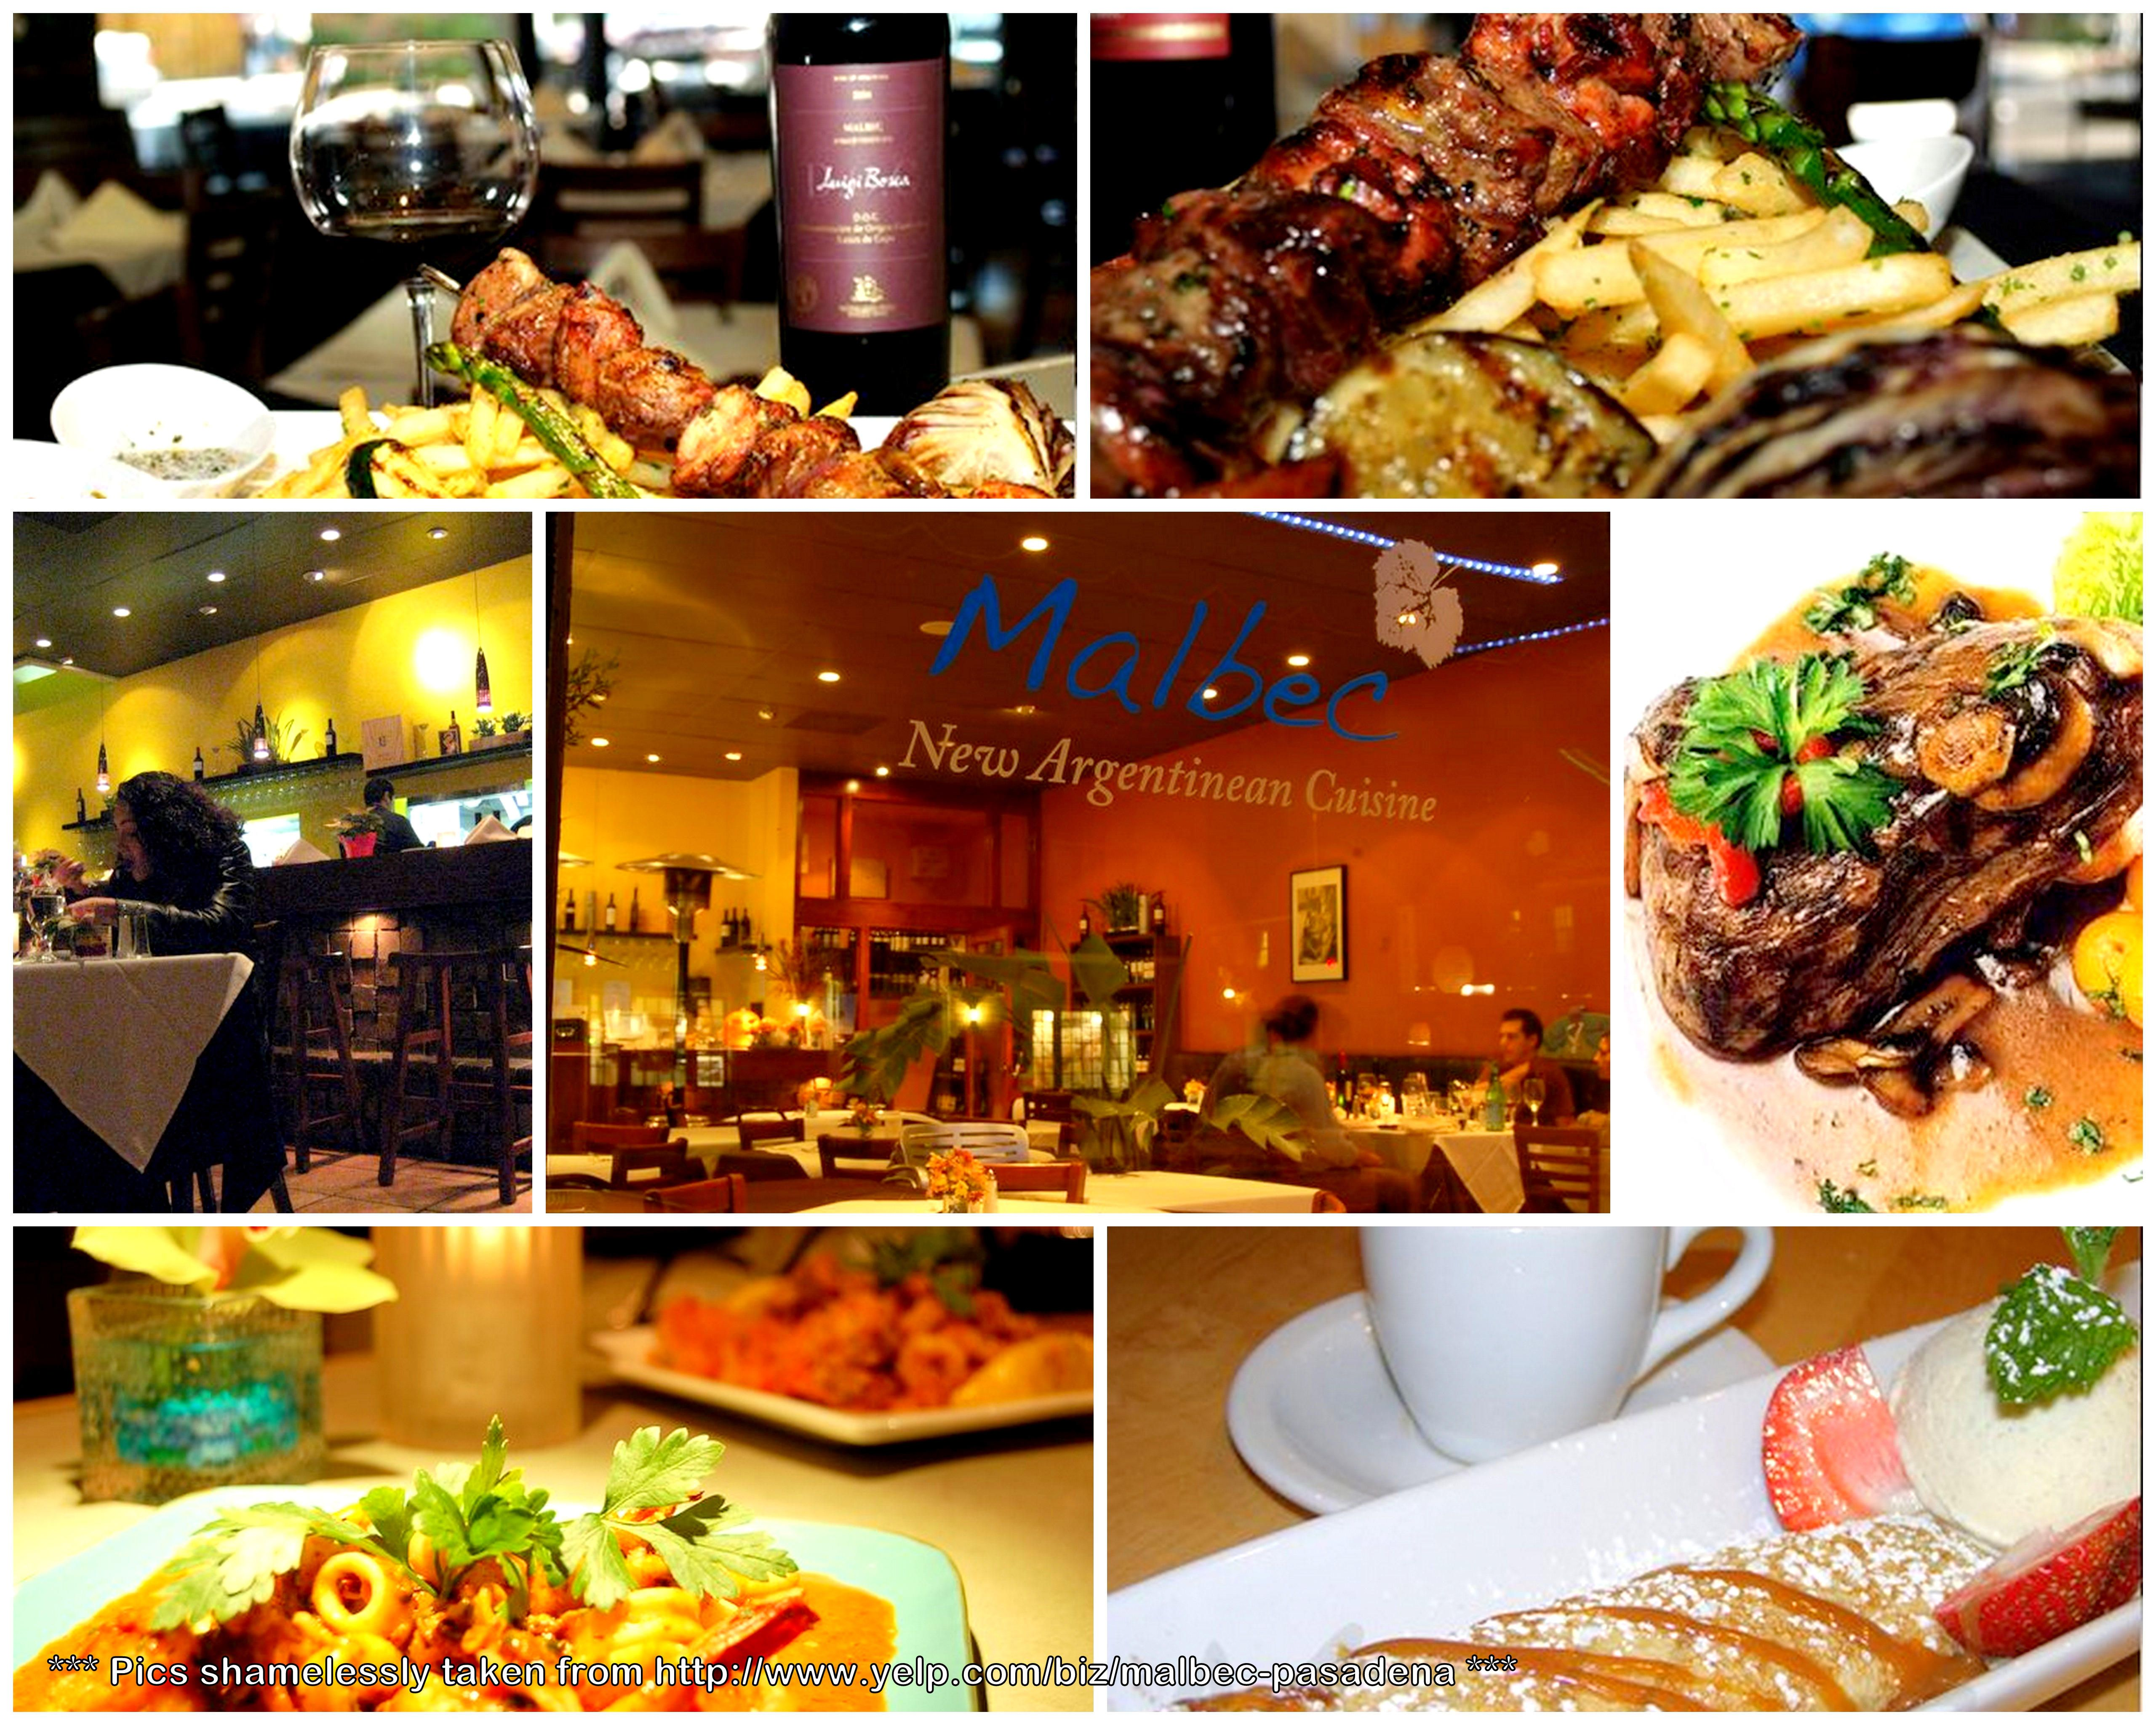 Argentine cuisine for Argentinian cuisine